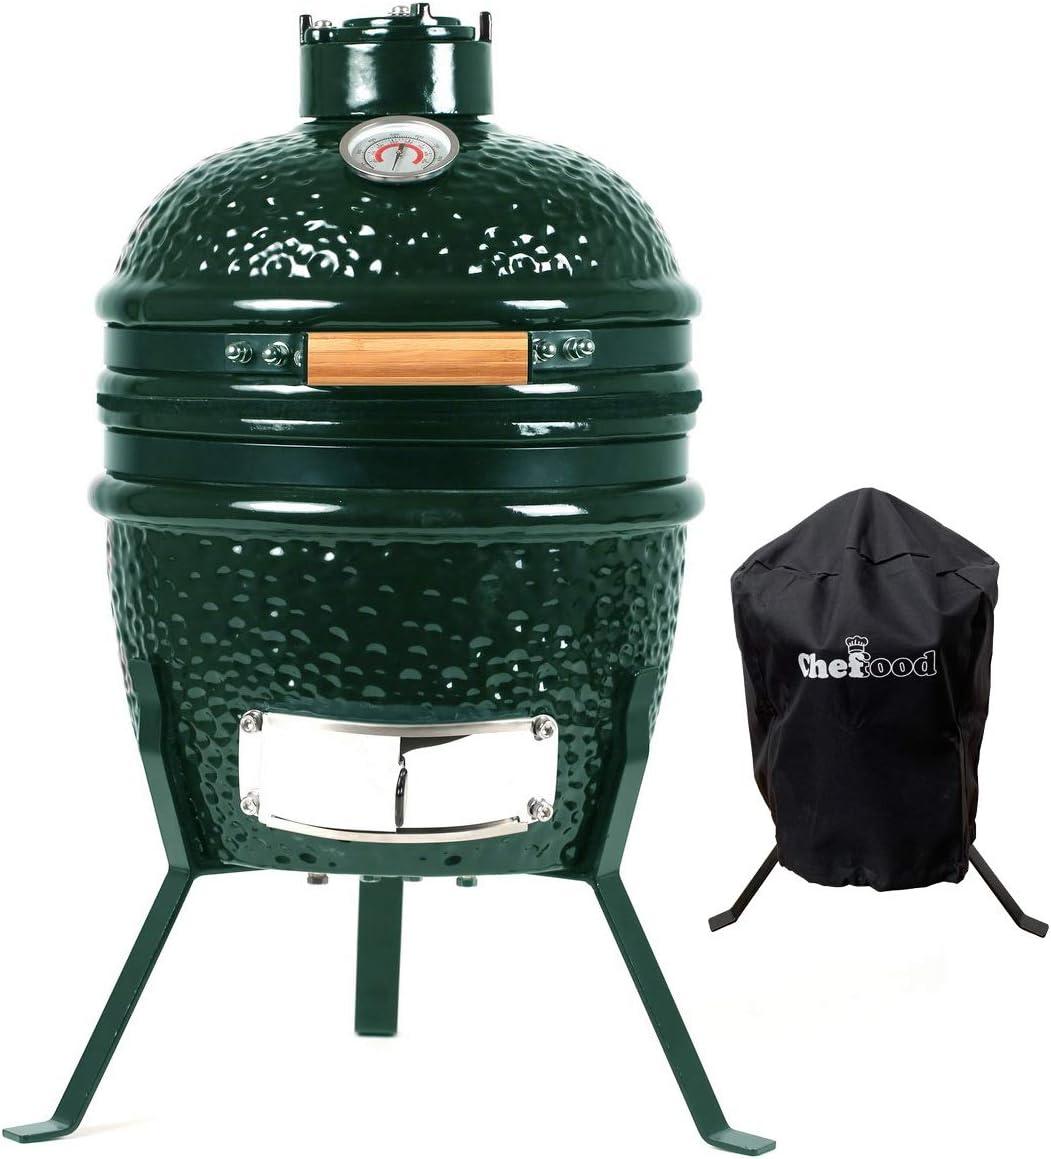 "Chefood13"" Ceramic Kamado:A fuel-efficient Kamado grill for all season"